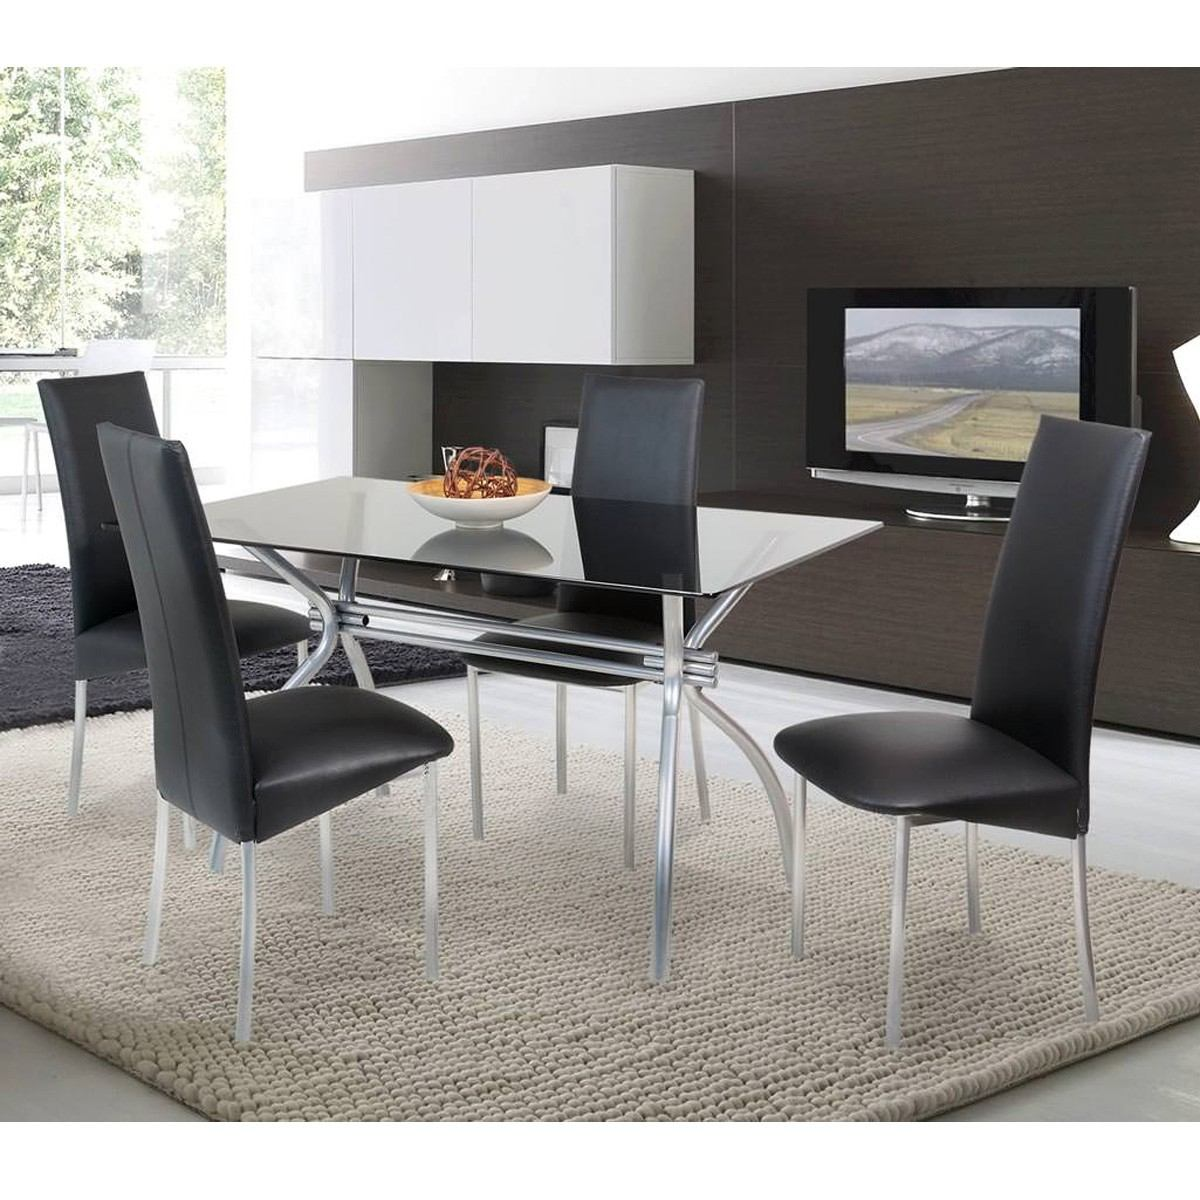 Mesa Comedor De Vidrio 1.60x0.80 + 4 Sillas Tap Ecocuero - $ 9.500 ...